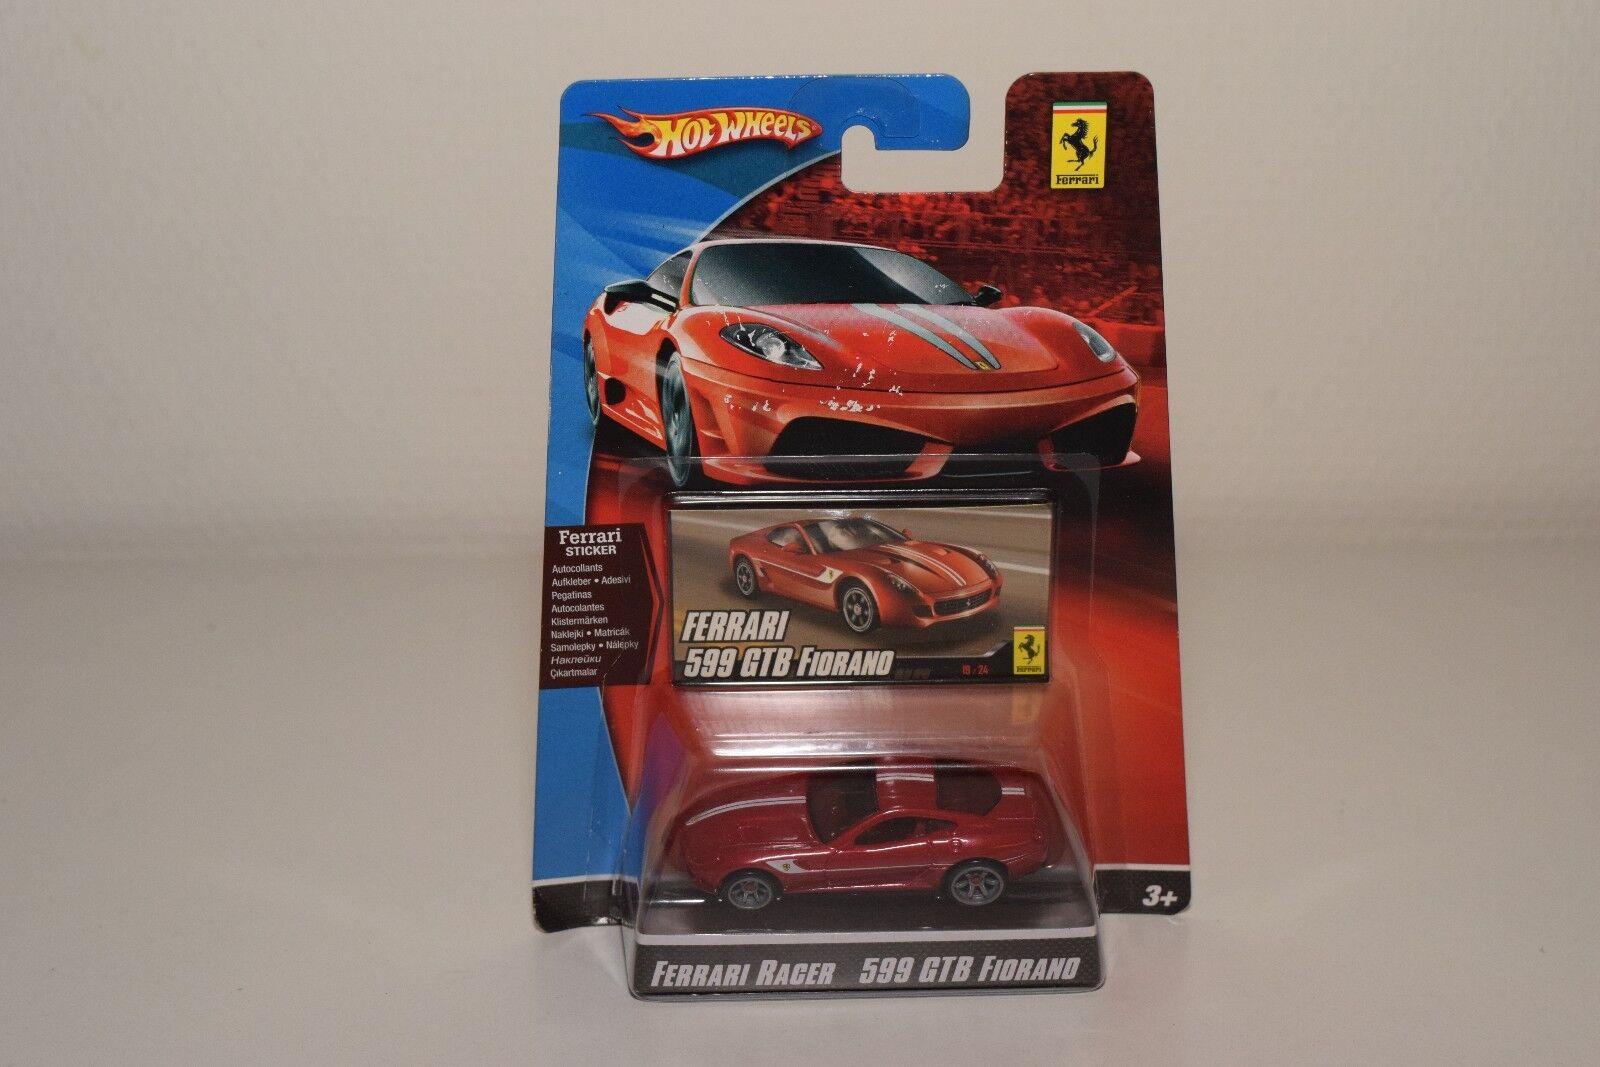 V 1 64 HOTWHEELS RACER FERRARI 599 GTB FIORANO RED MINT BOXED ON CARD RARE